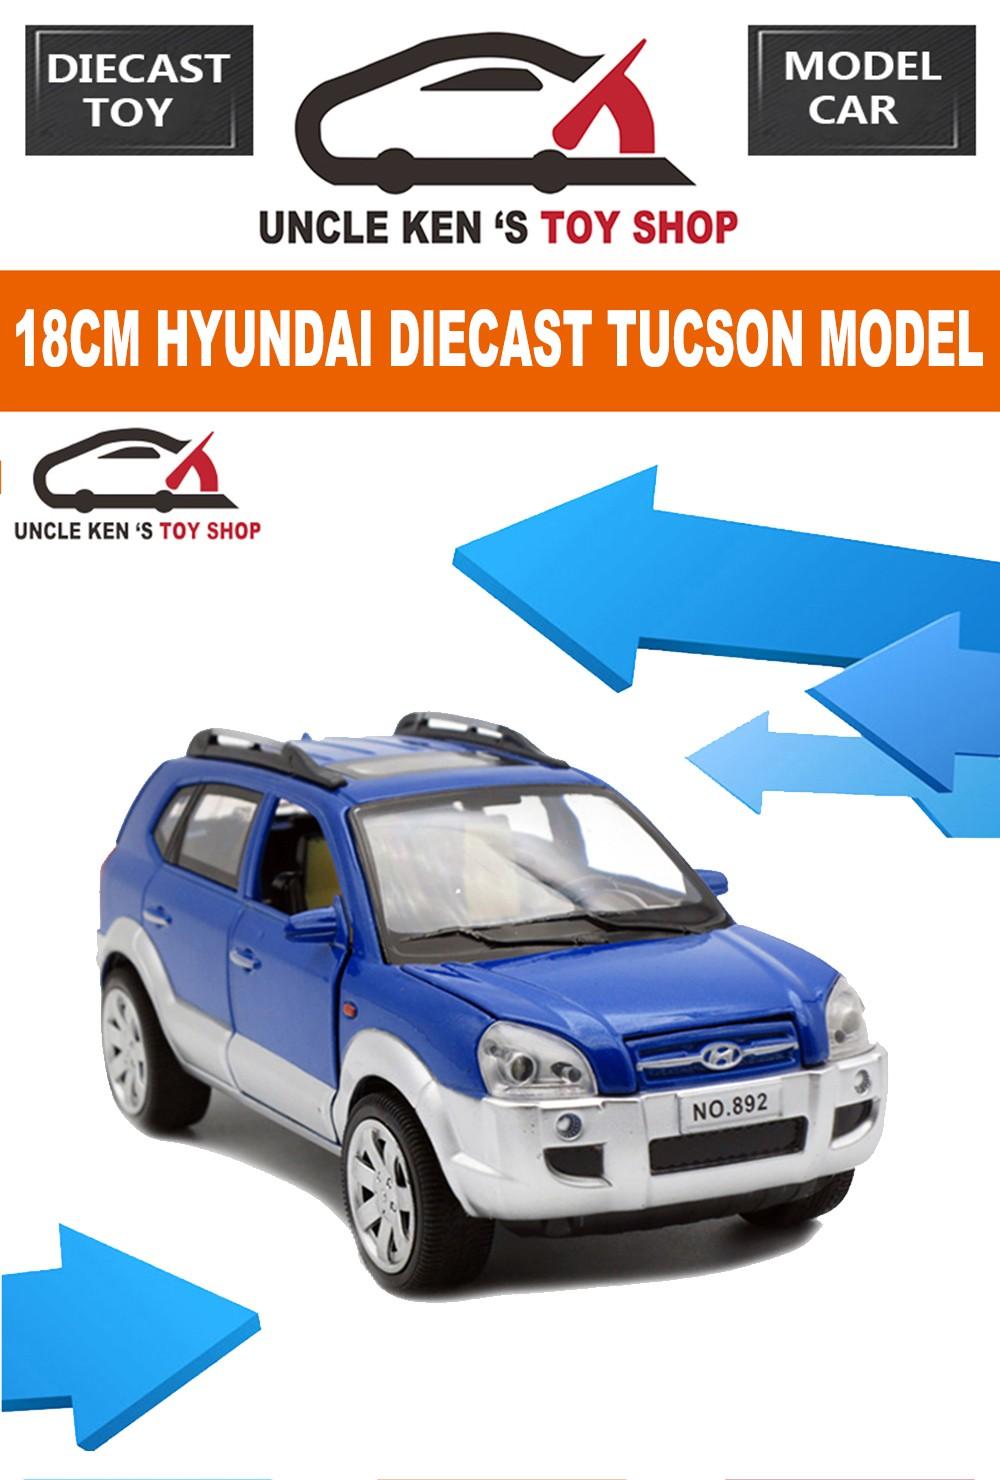 samochodów, Tucson zabawki model 1